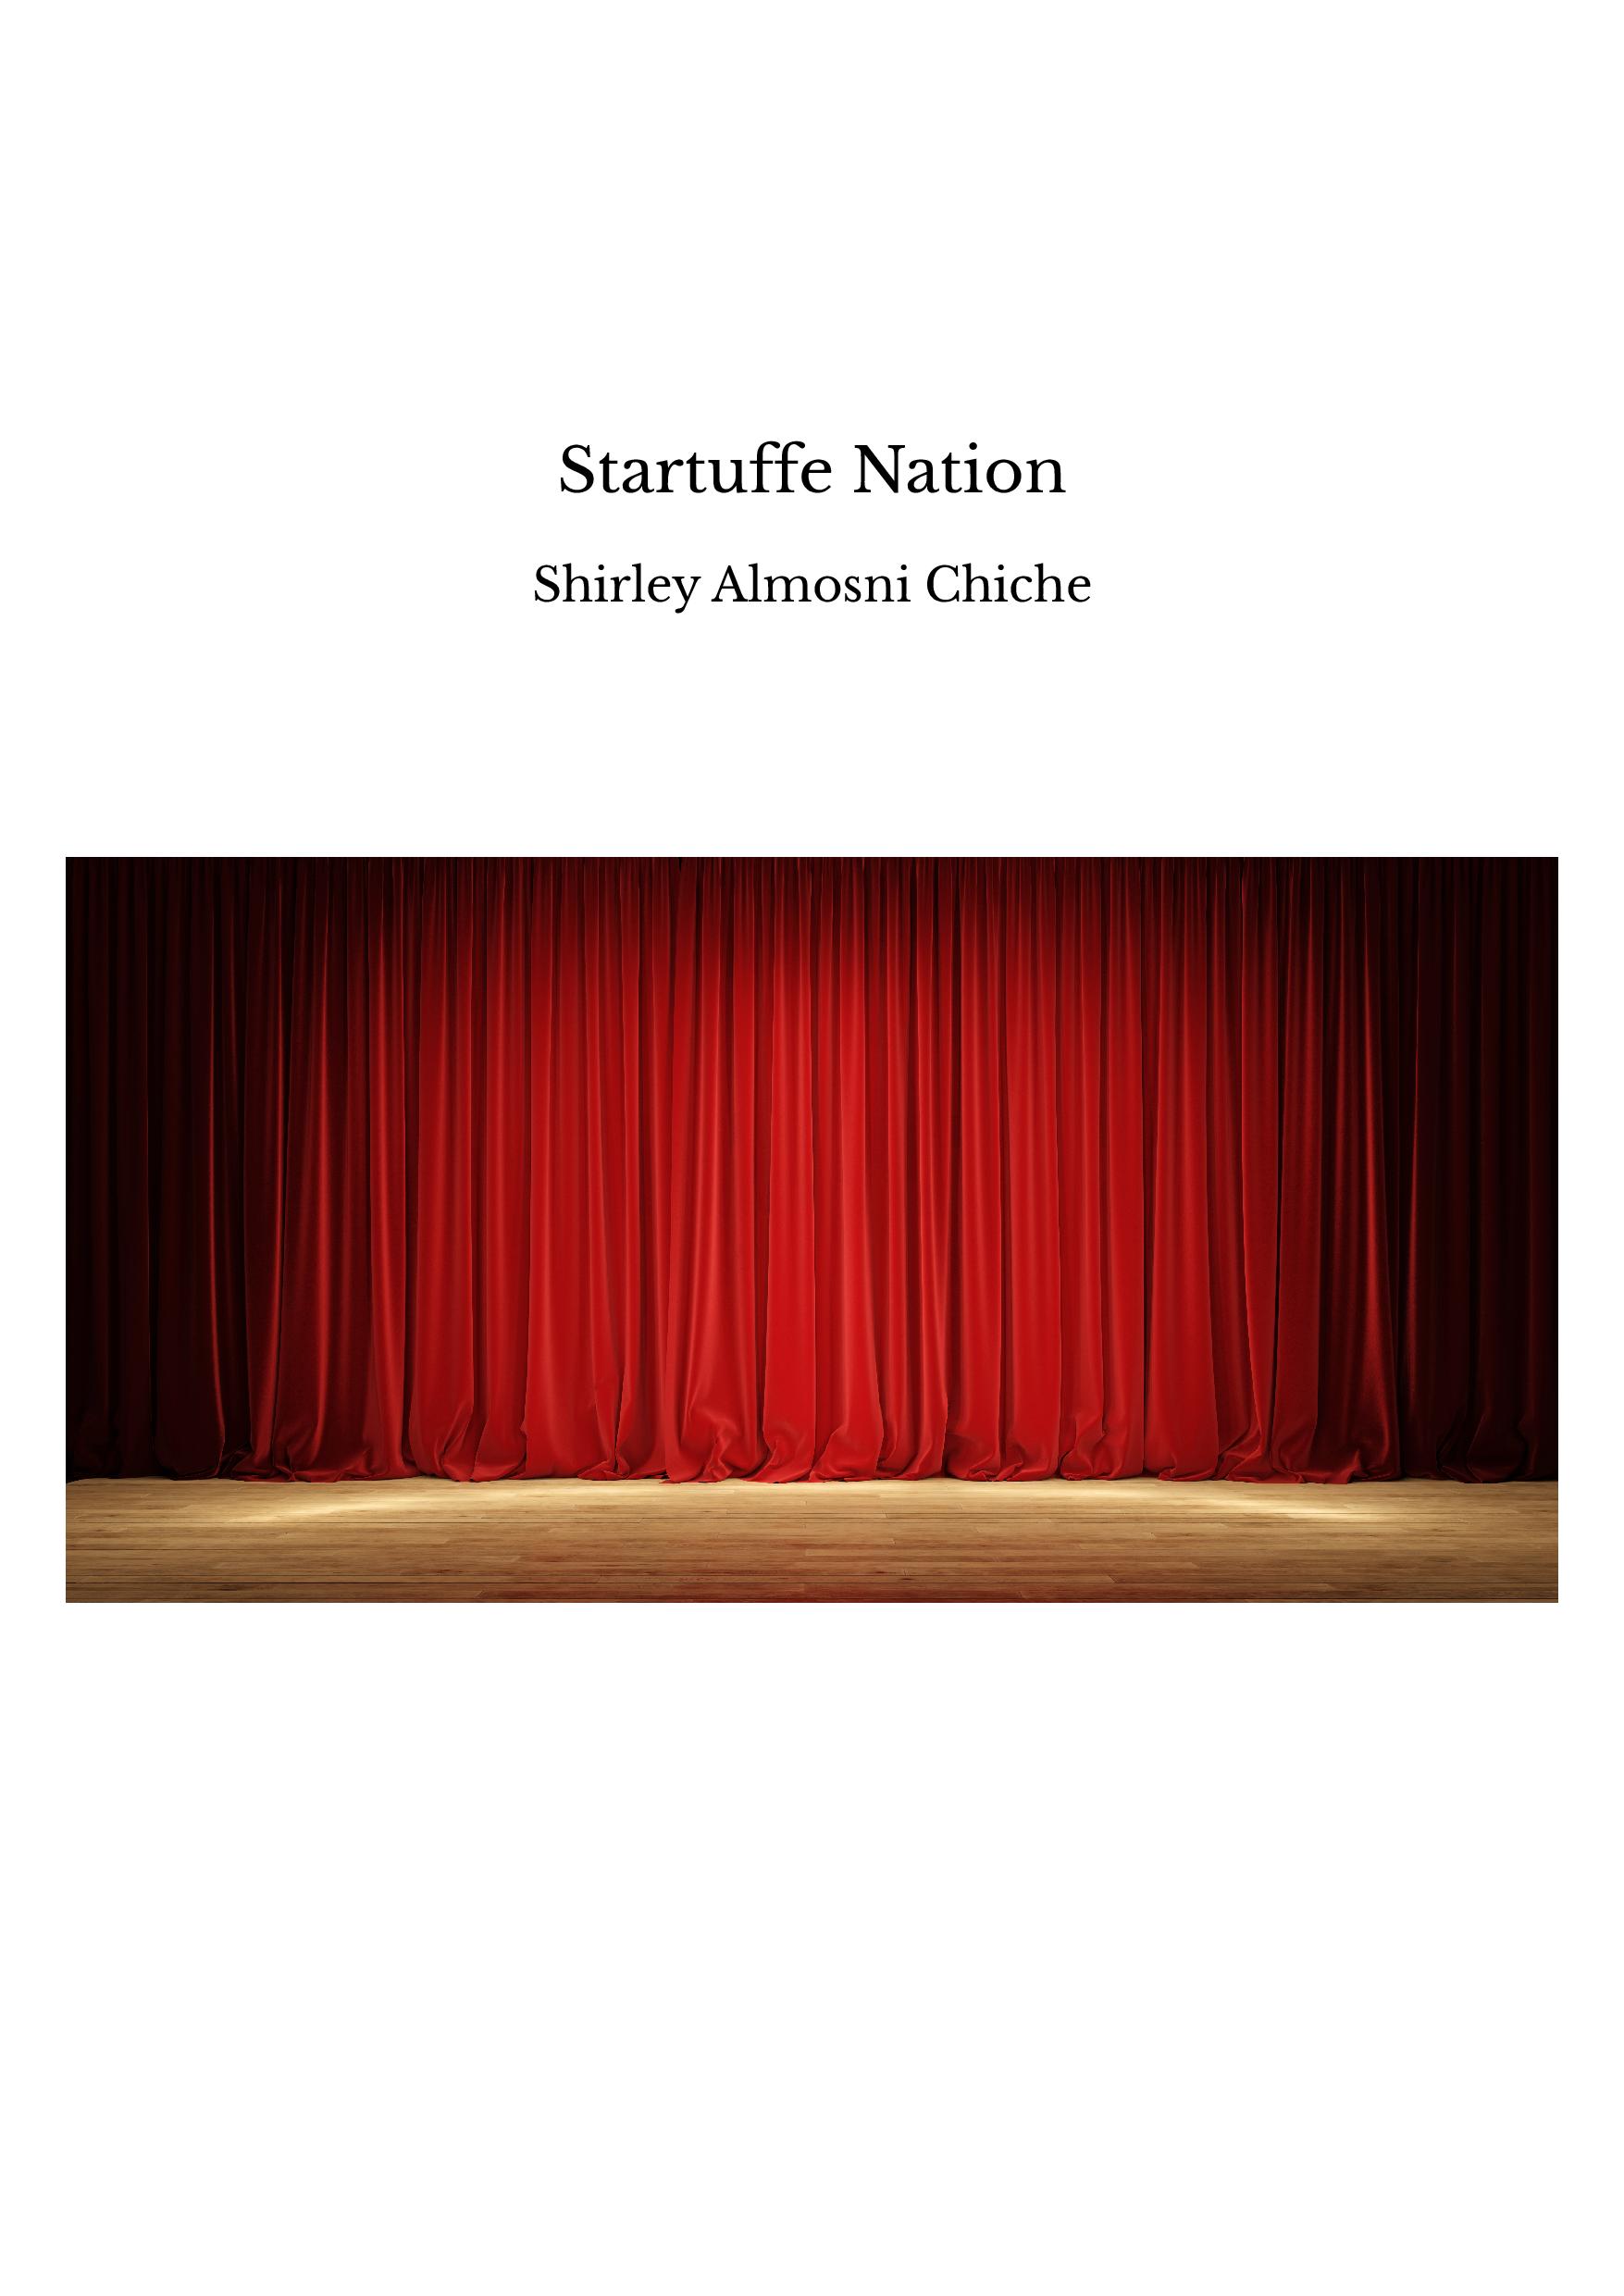 Startuffe Nation